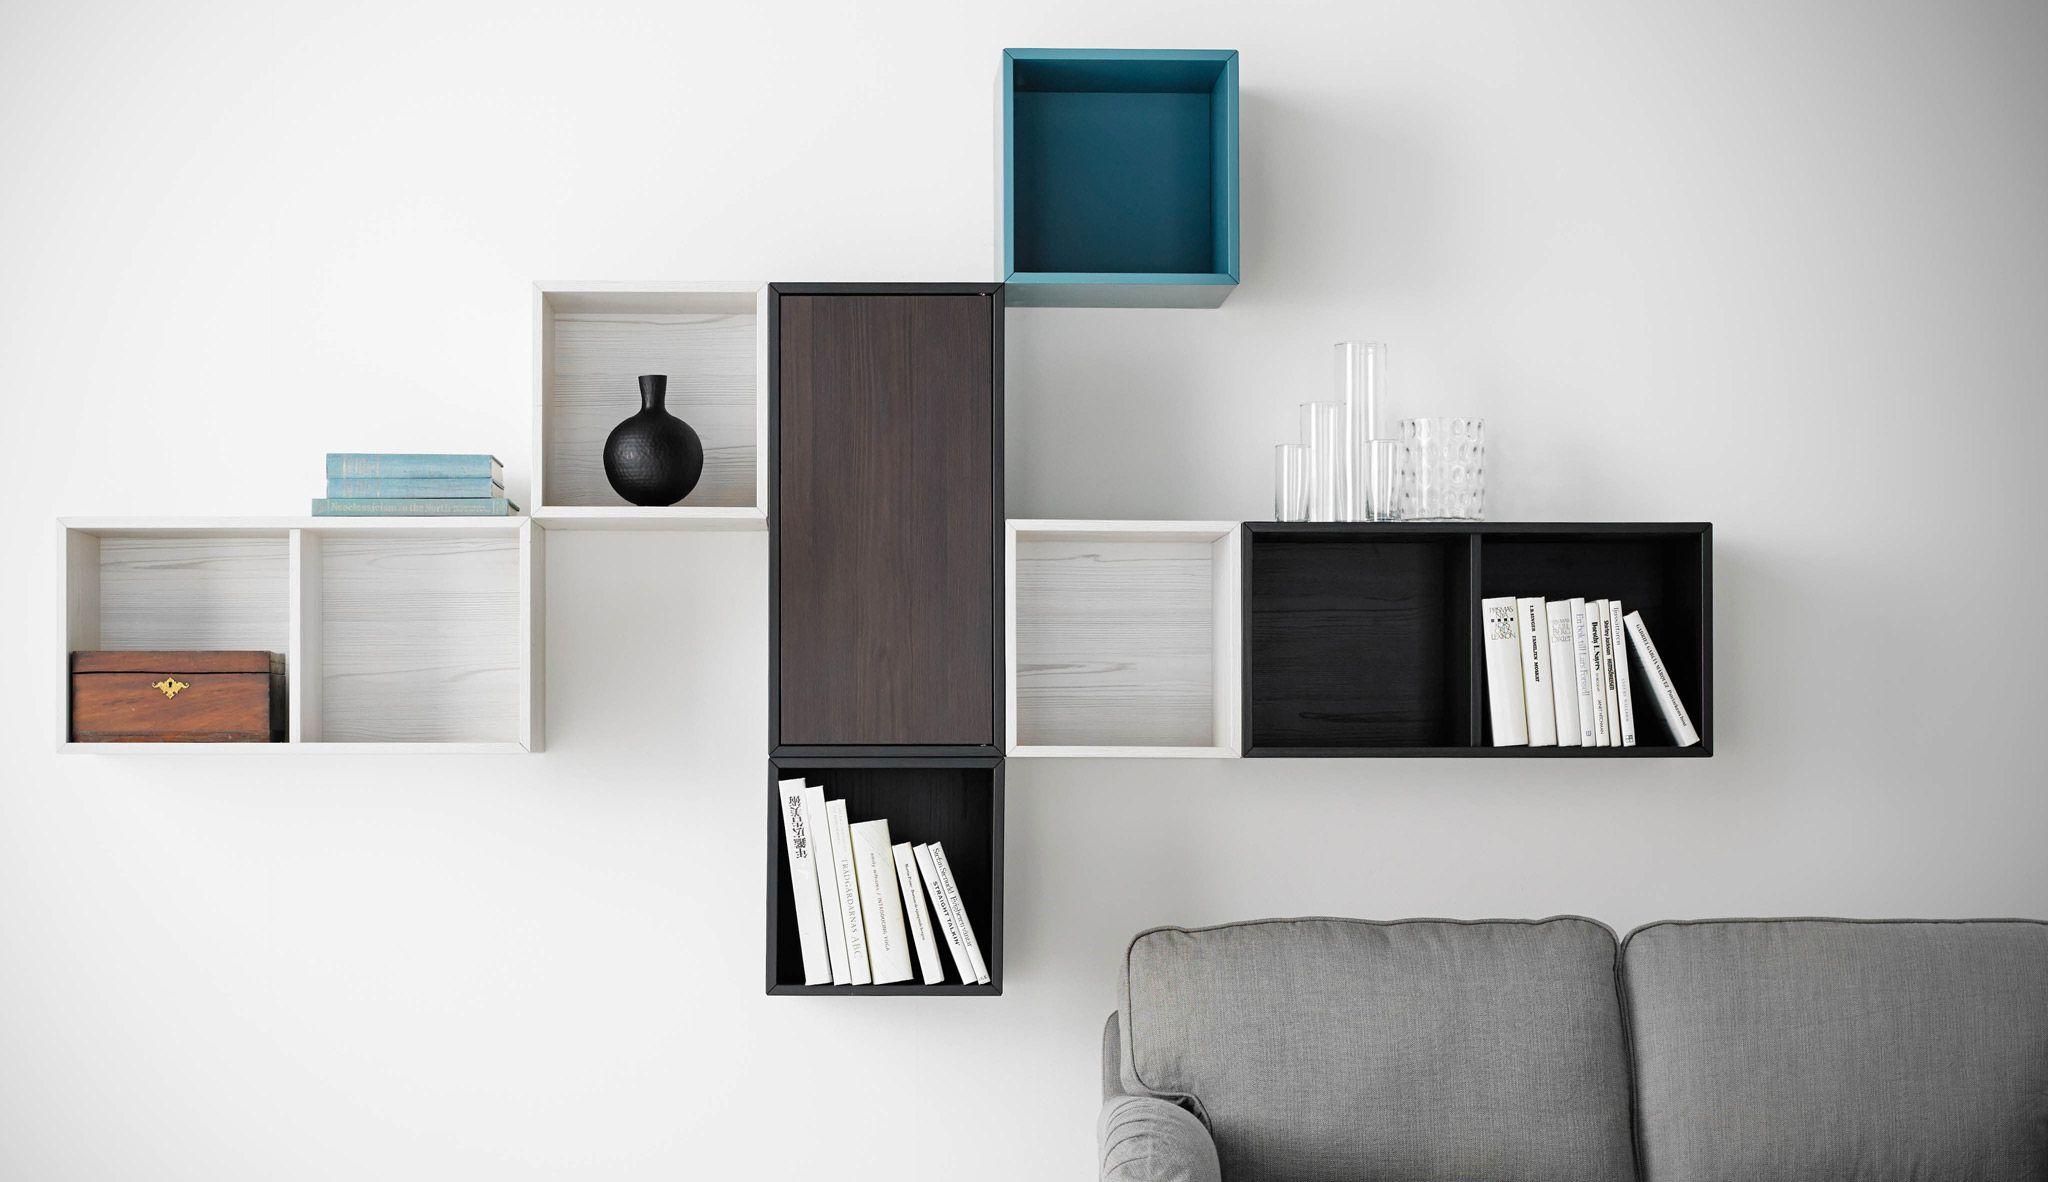 Image Result For Ikea Wall Display Arredamento D Interni Arredamento Casa Arredamento